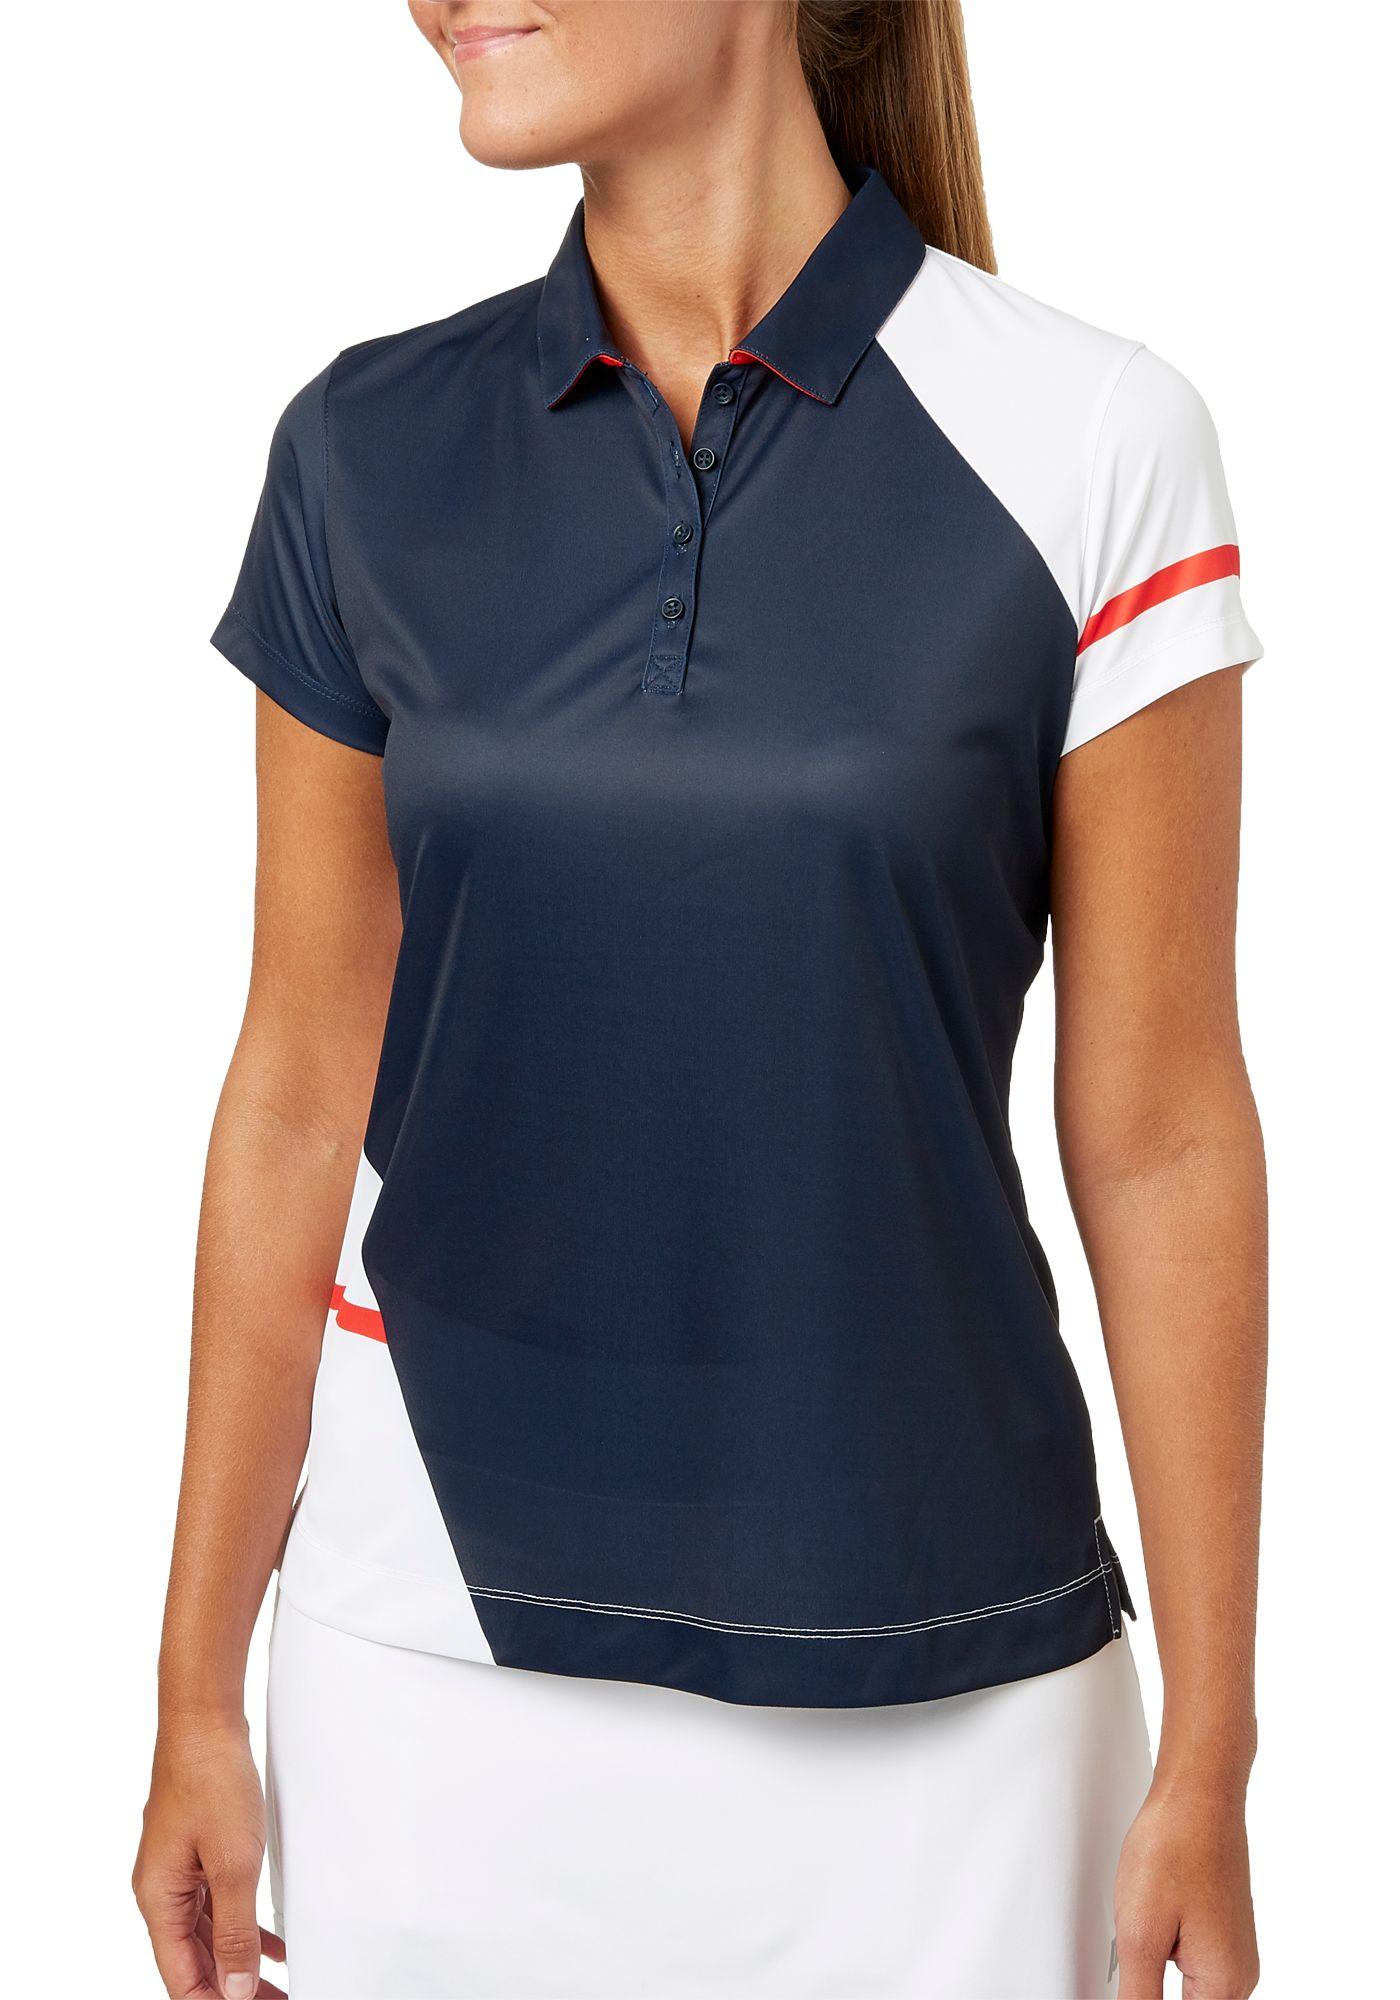 Slazenger Women's Lite It Up Collection Asymmetrical Golf Polo